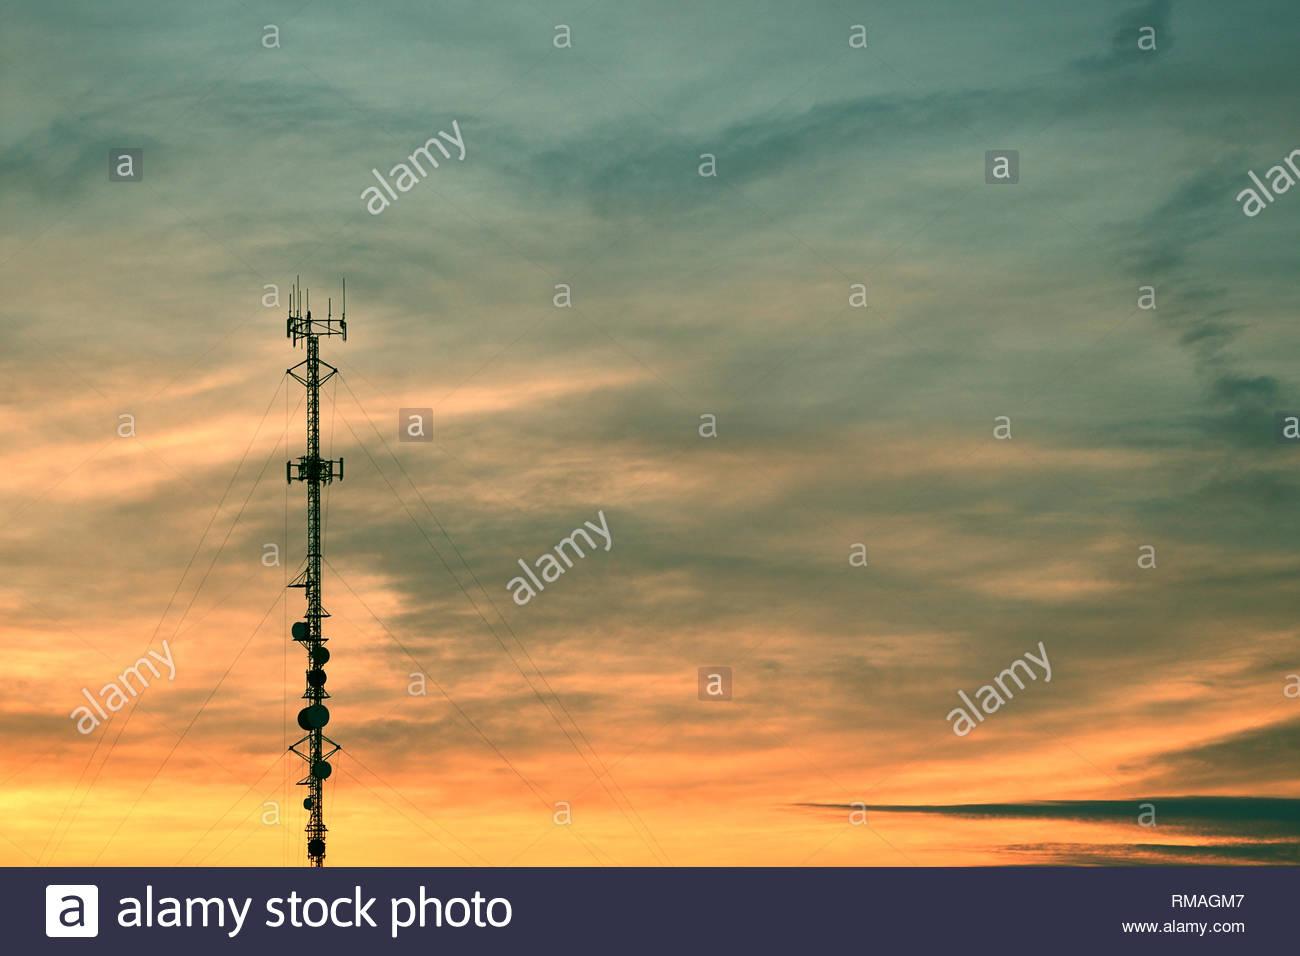 Hohe Antenne Pole Stockbild